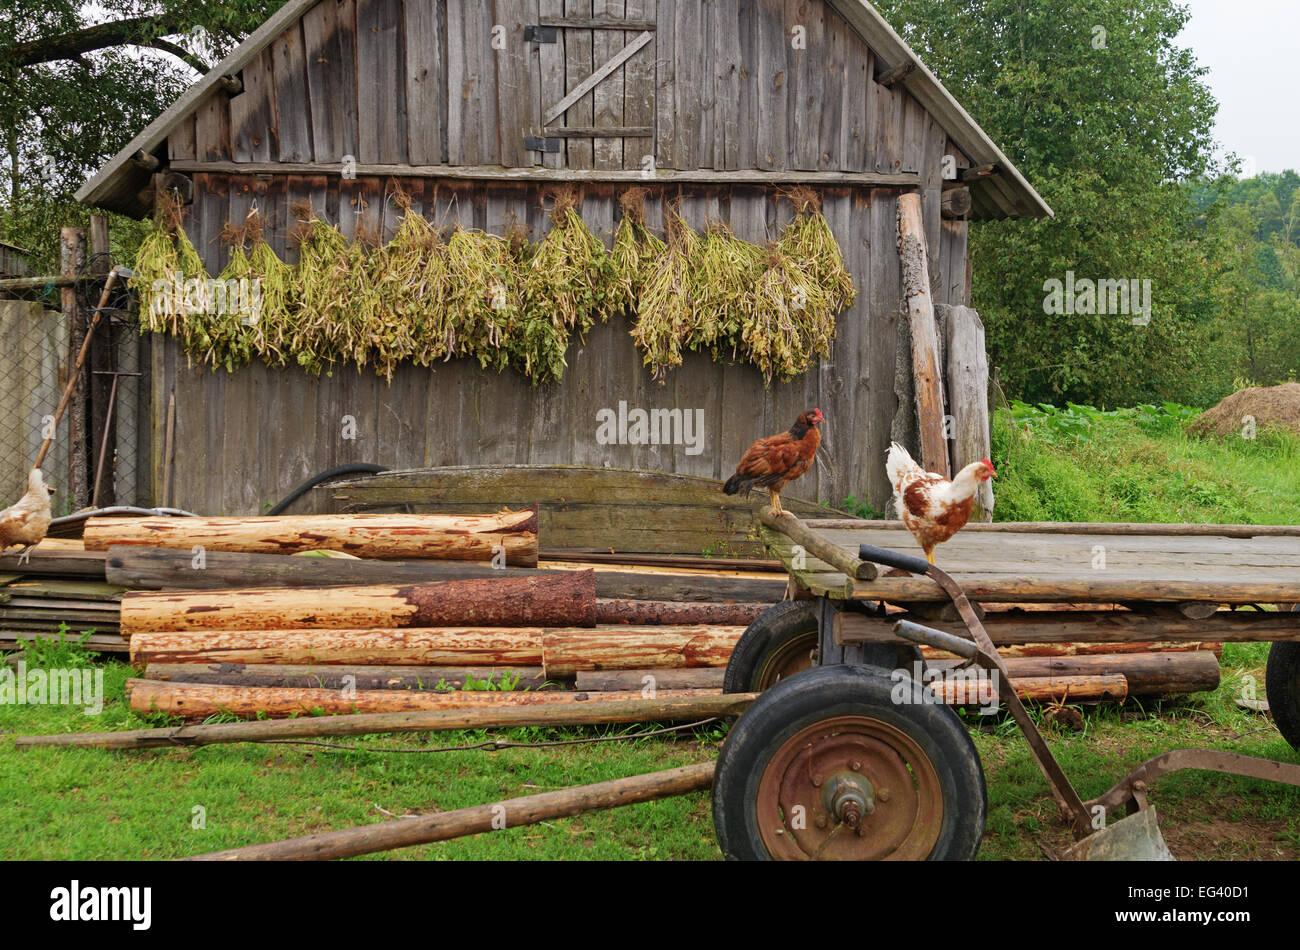 Plow shack